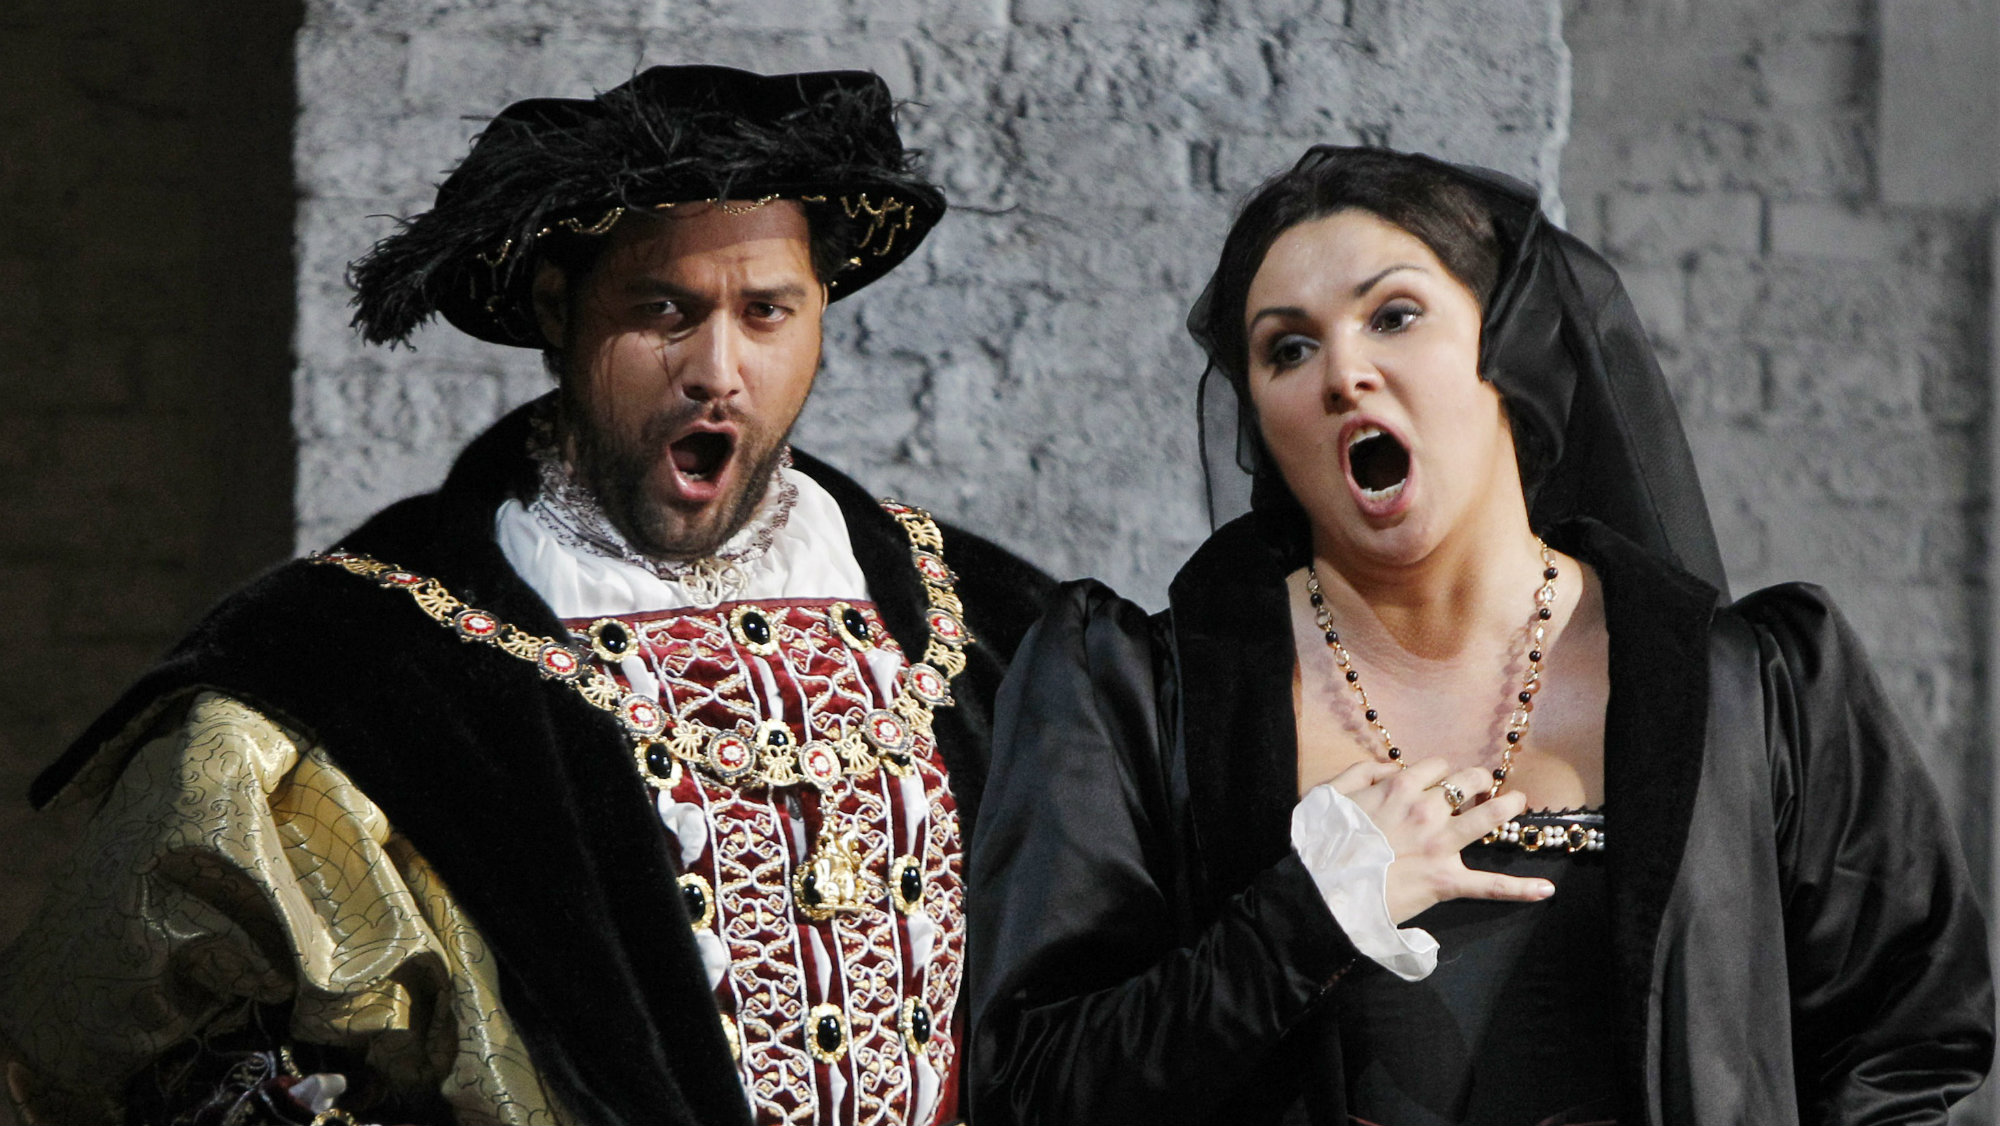 "In this Sept. 22, 2011, photo, Bass Ildar Abdrazakov, left, portrays Henry VIII, King of England, with co-star soprano Anna Netrebko as Anne Boleyn during the final full dress rehearsal for Gaetano Donizetti's ""Anna Bolena,"" at the Metropolitan Opera in New York."